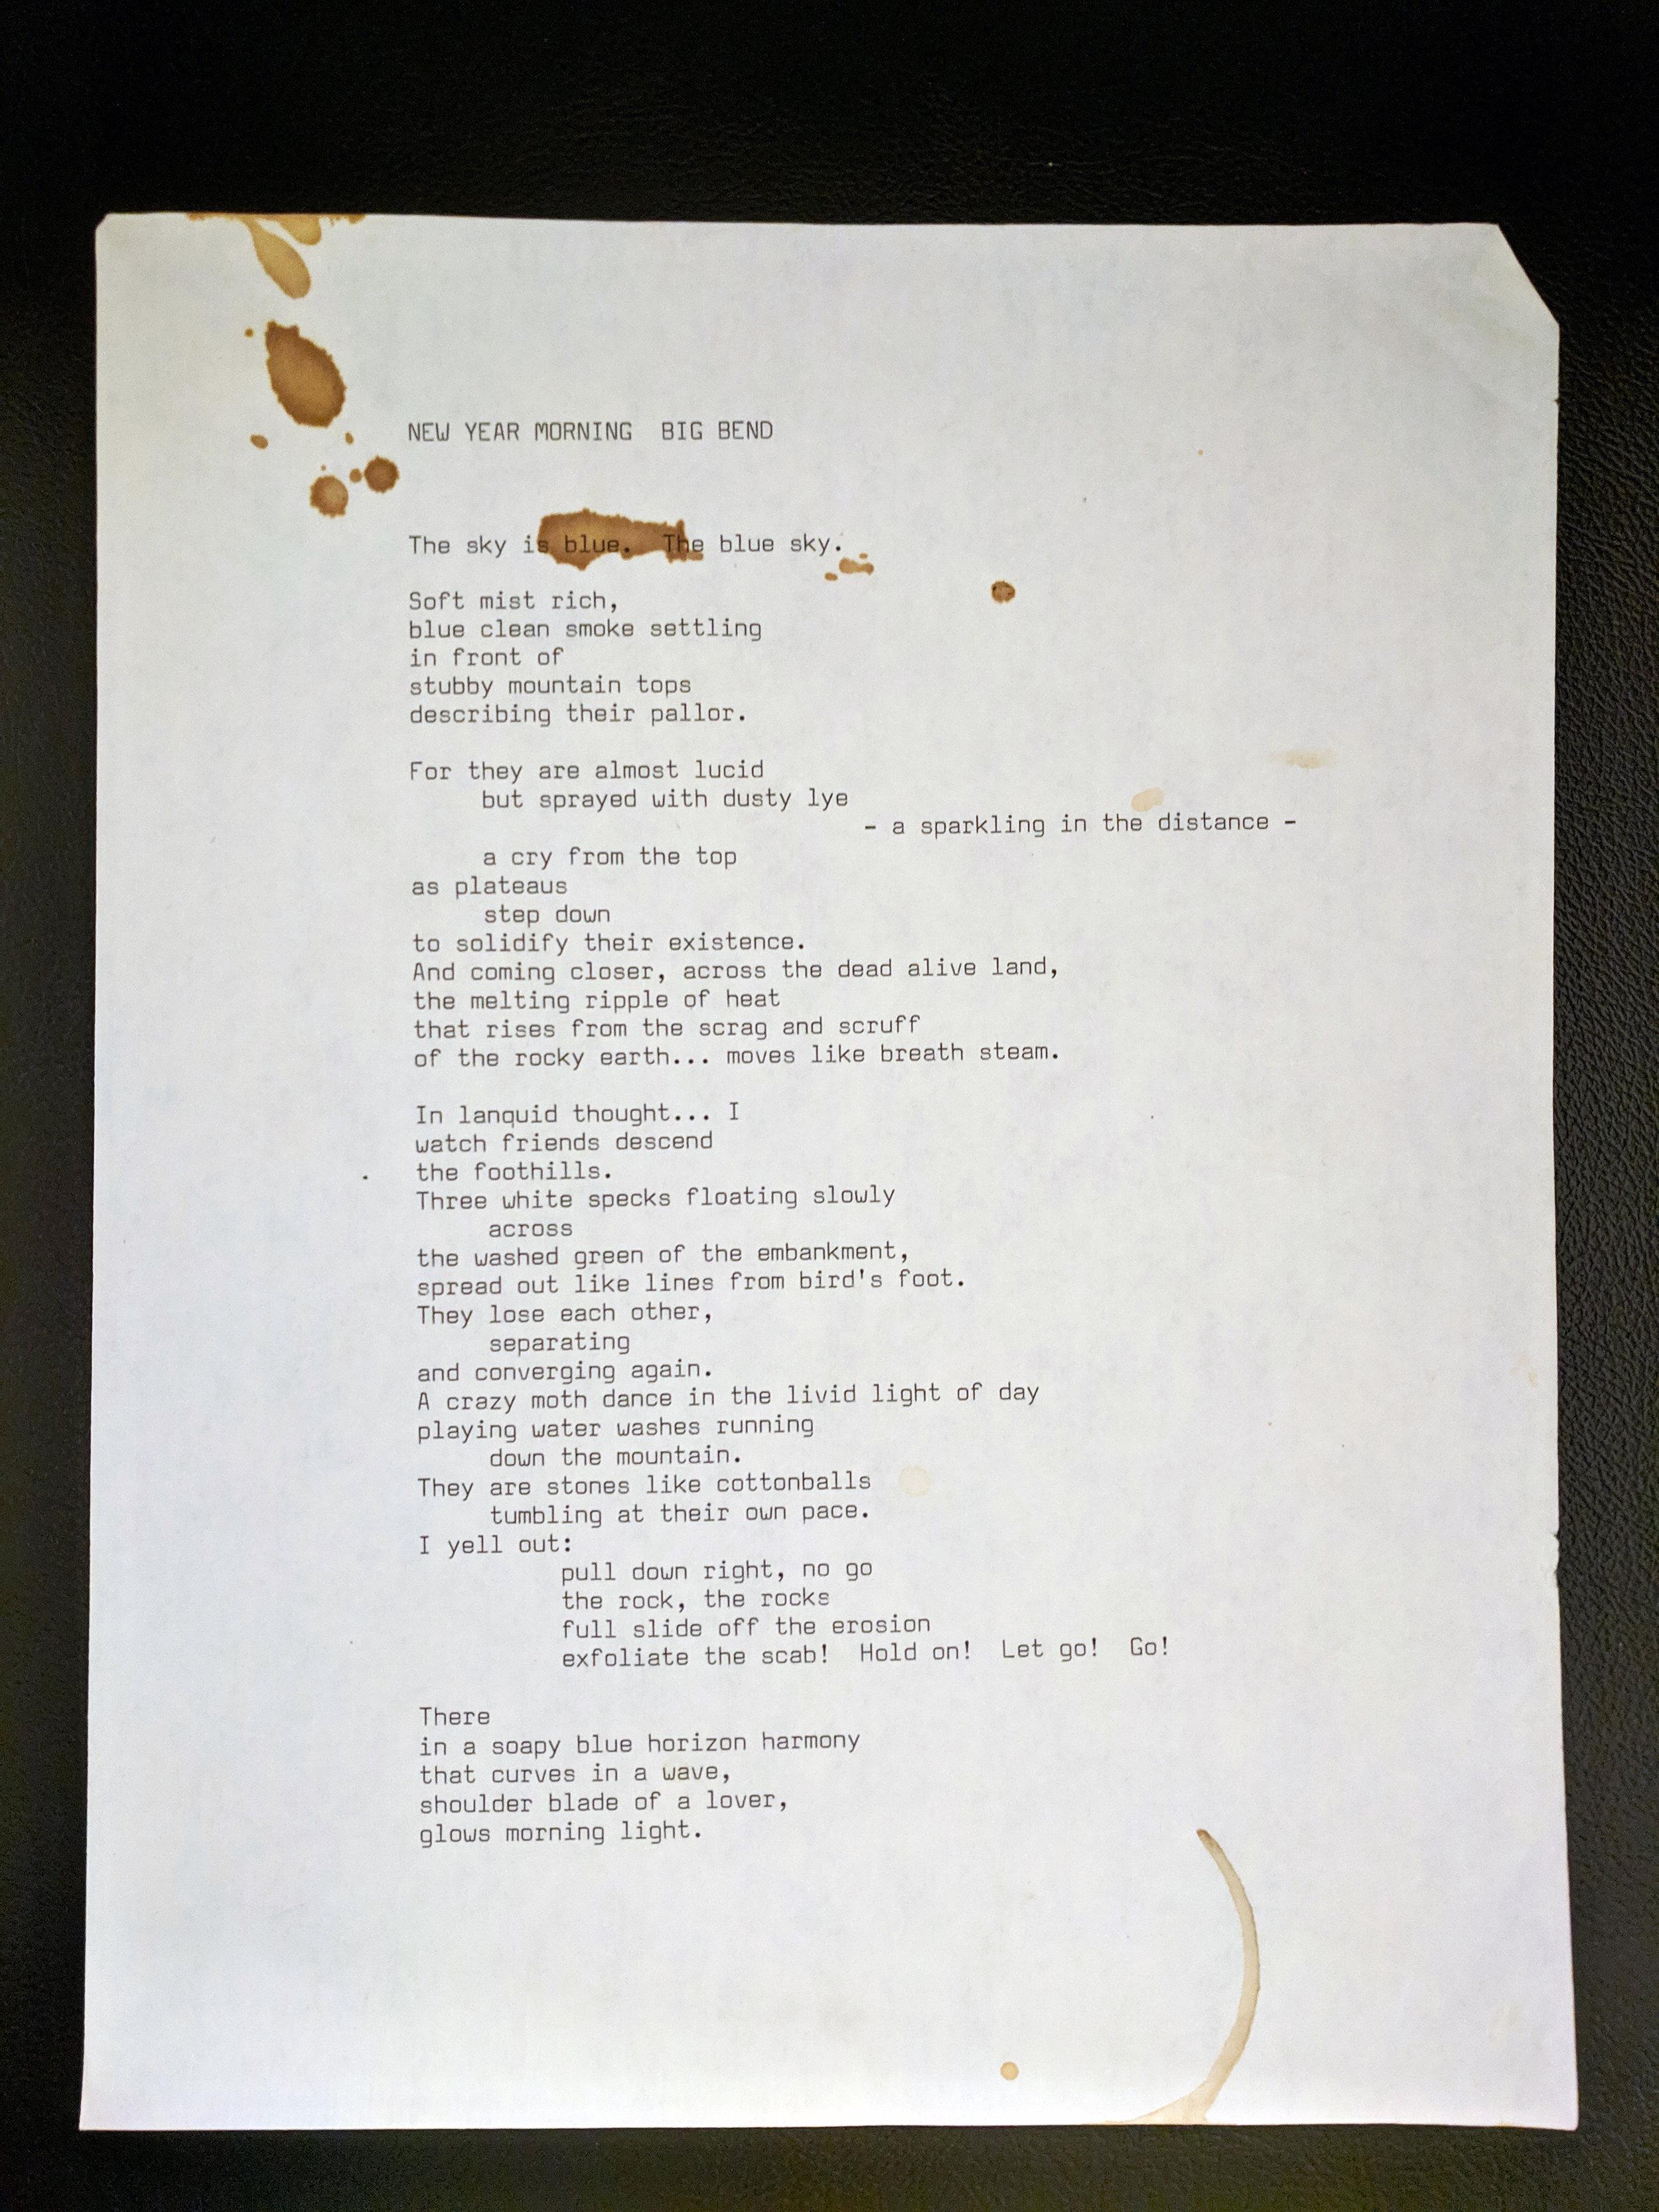 BegBend_NewYear_Poem_01.jpg